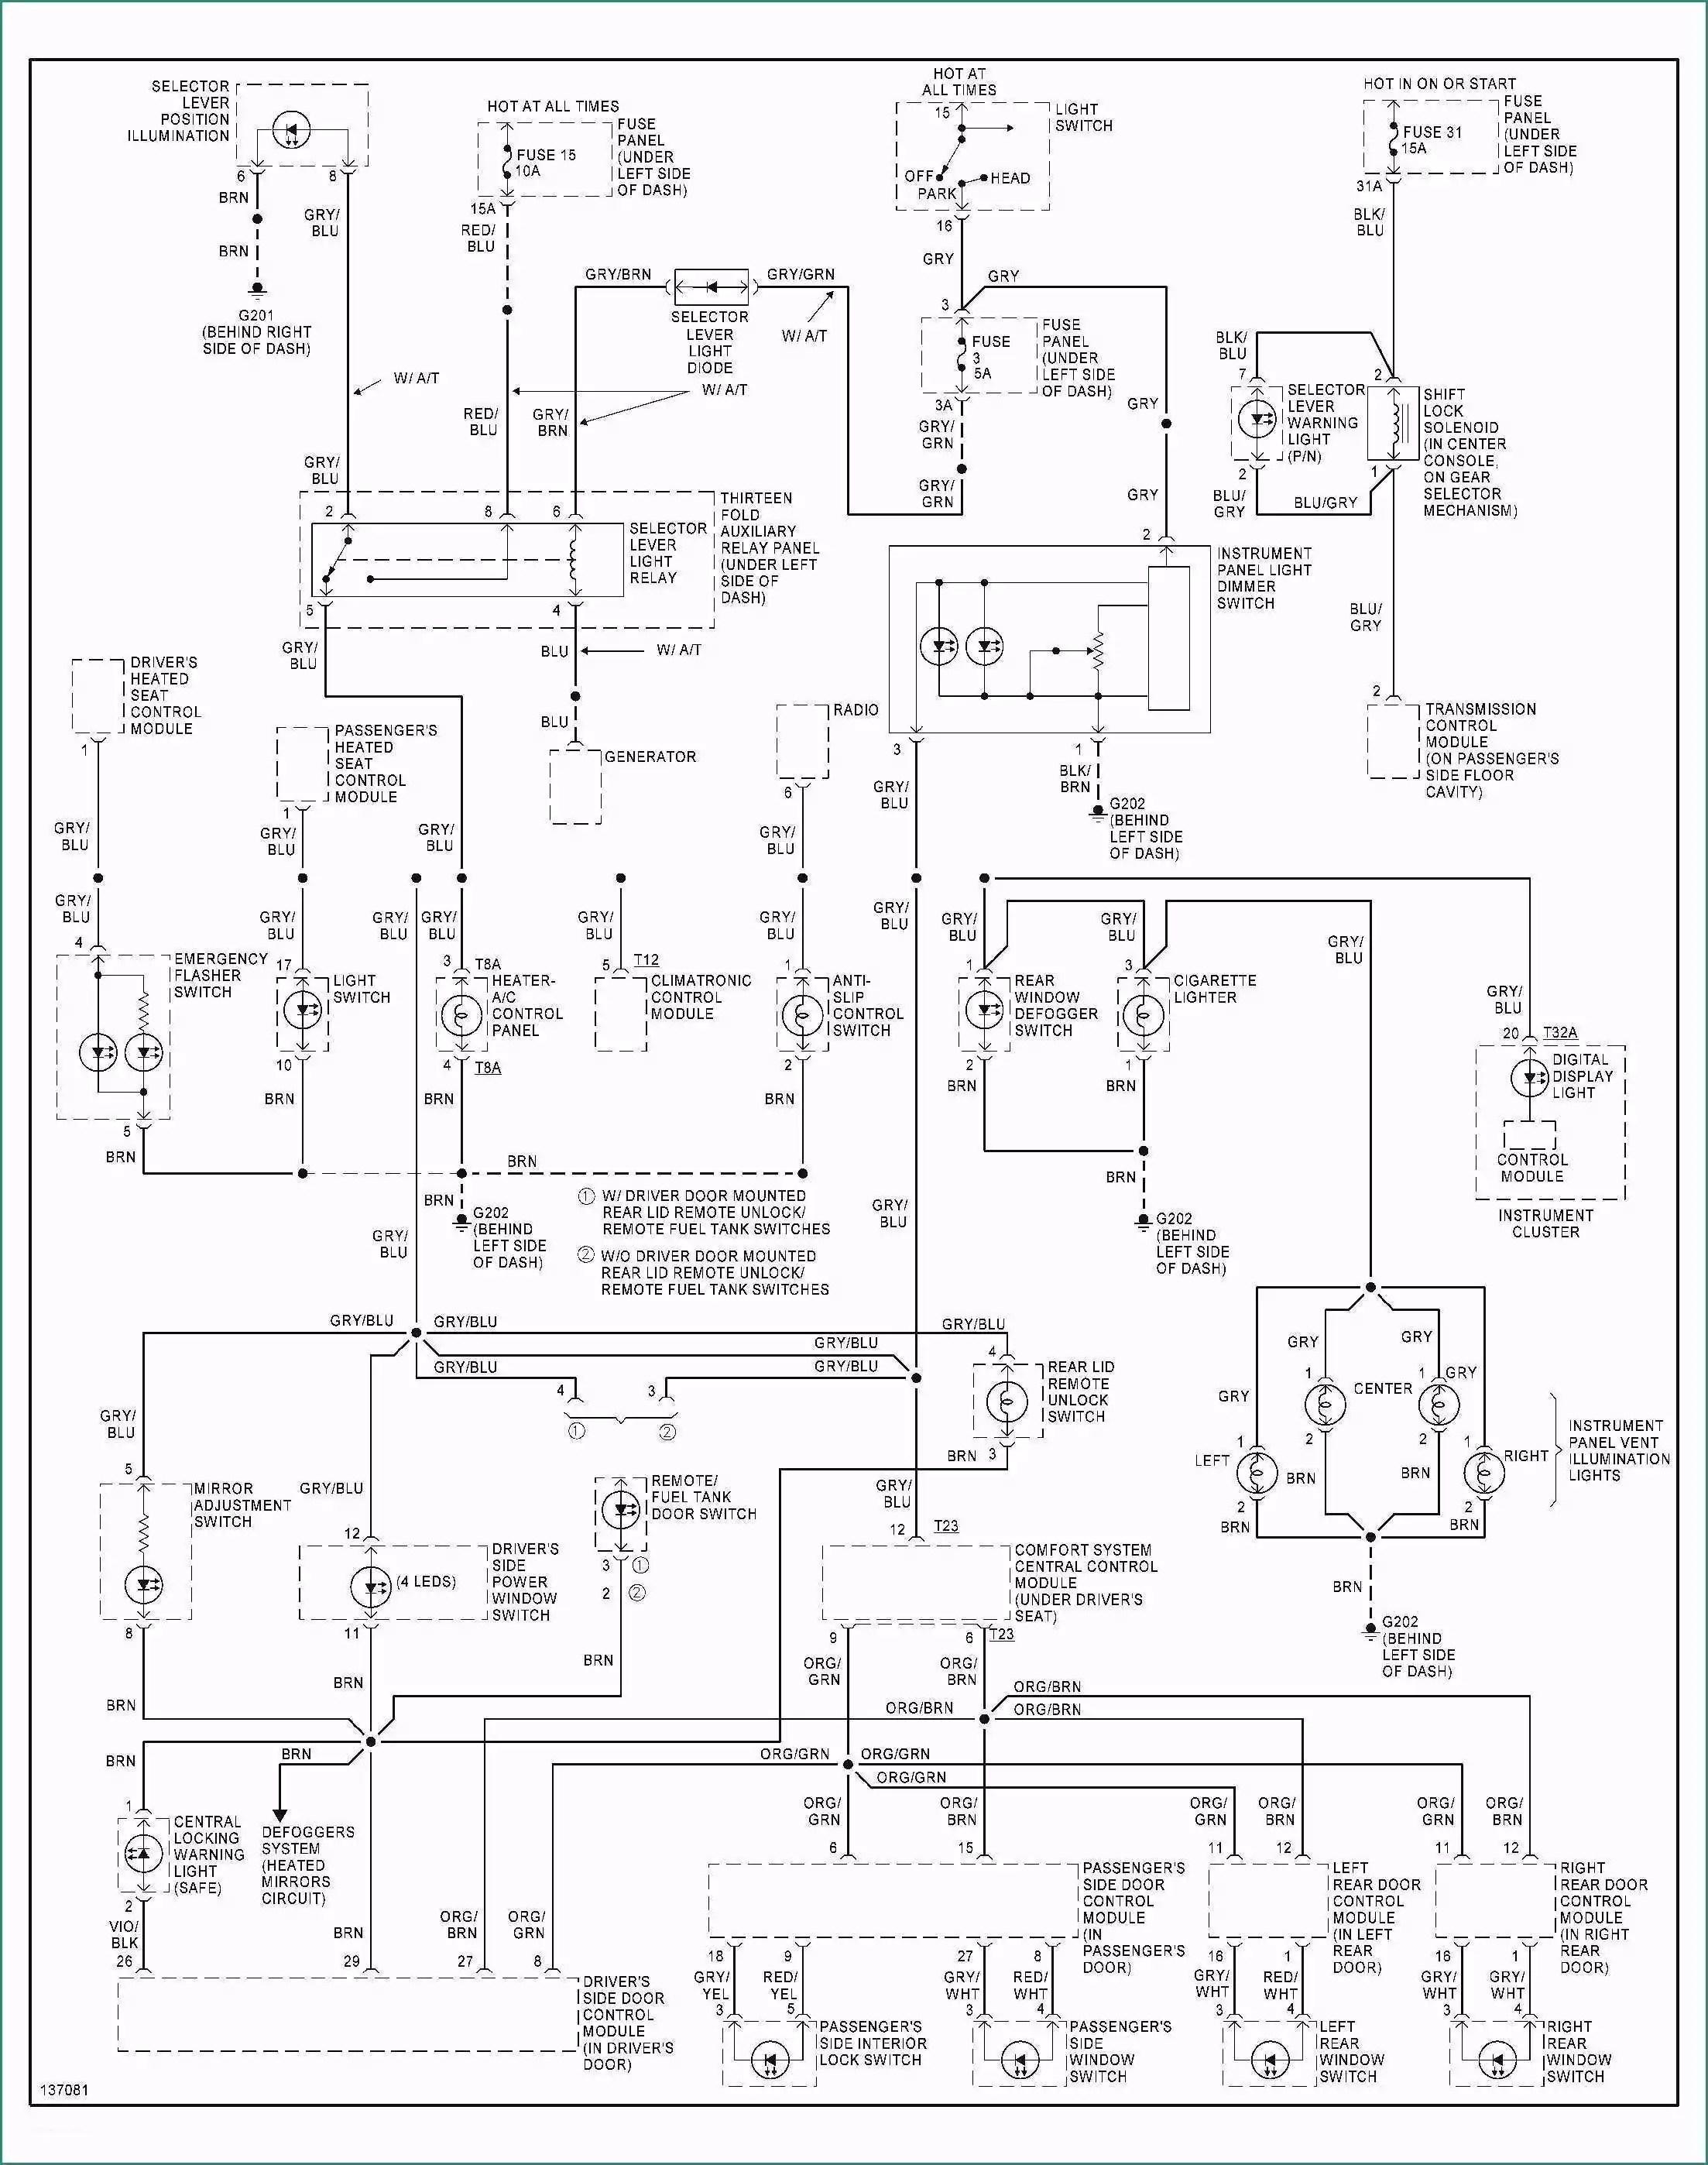 Serra Bioclimatica Dwg E 175 Mcmicro Puter by Adpware